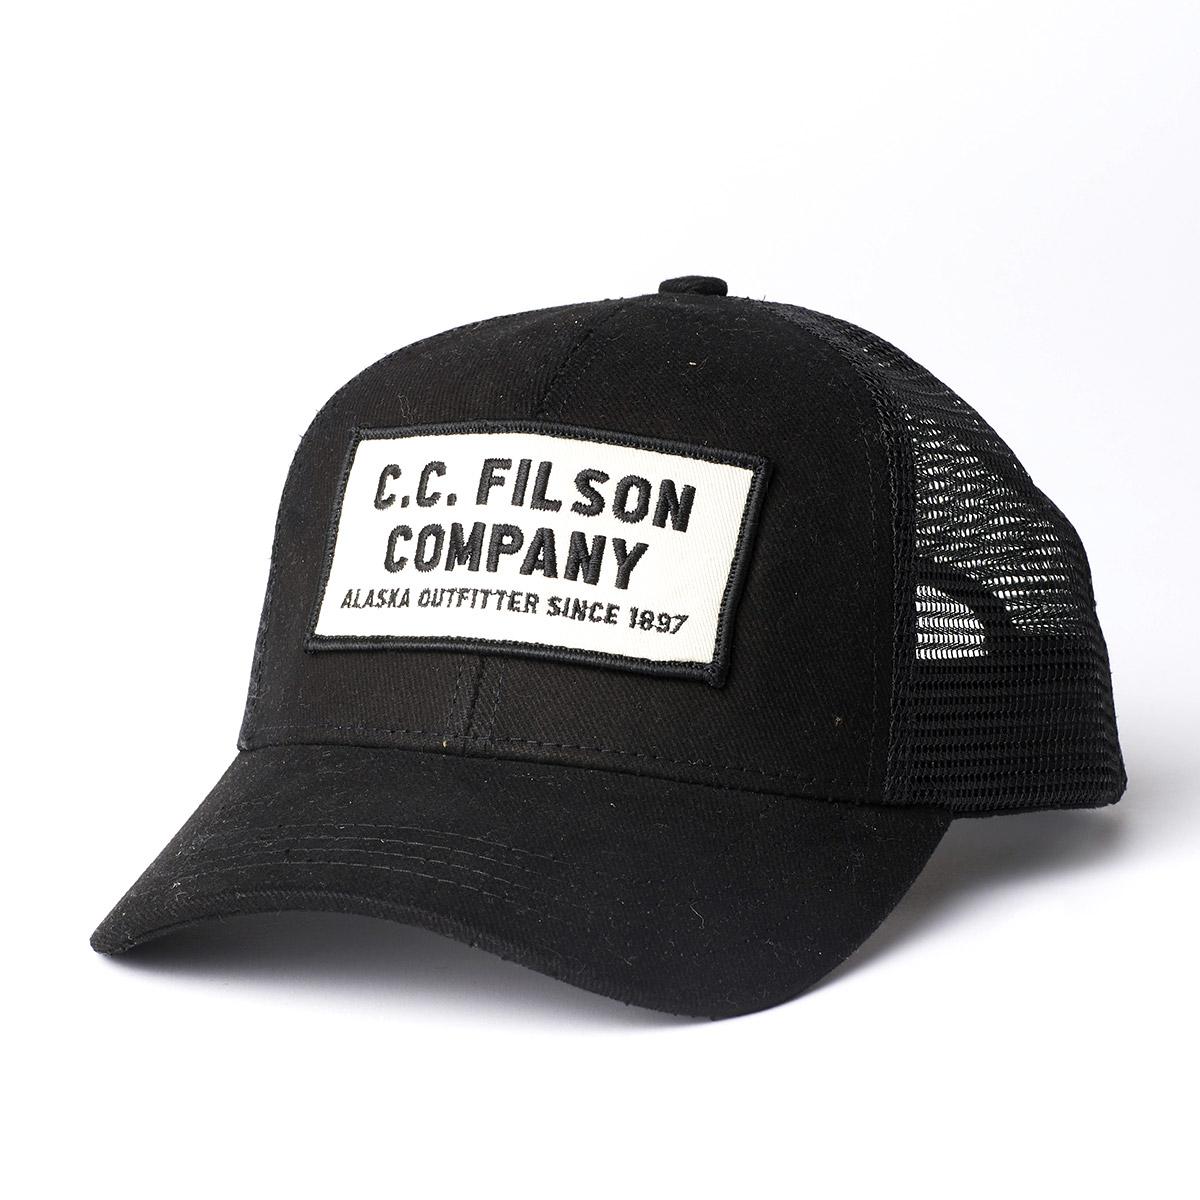 Filson Mesh Snap-Back Logger Cap 20172157 Black, durable cap with breathable sun protection